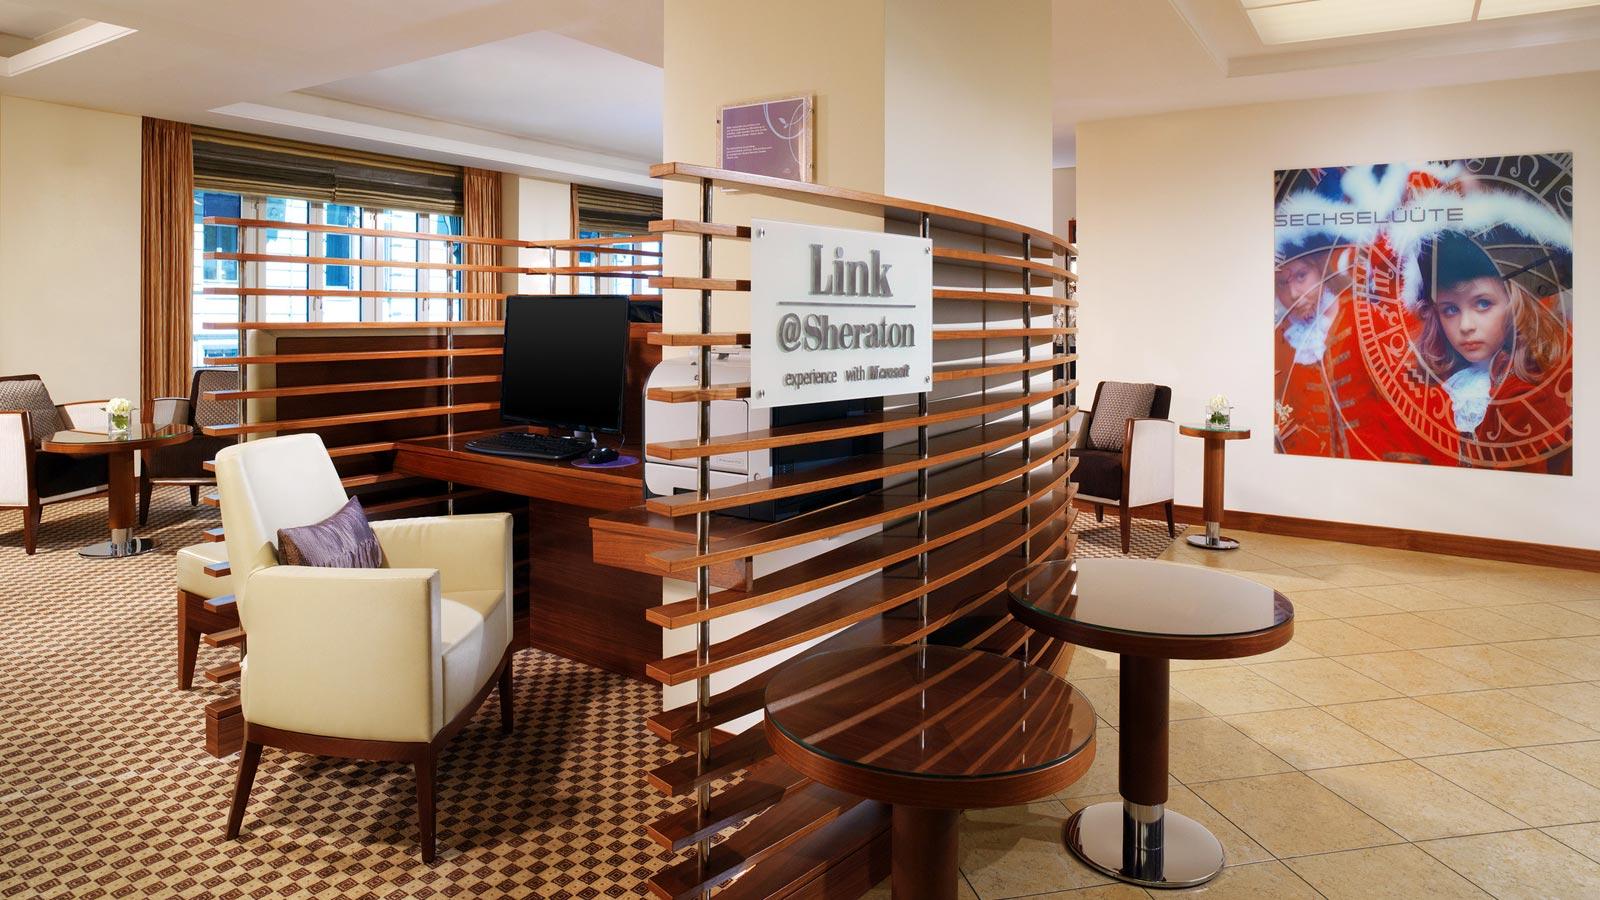 Sheraton-Zrich-Neues-Schloss-Hotel-Link-at-Sheraton2